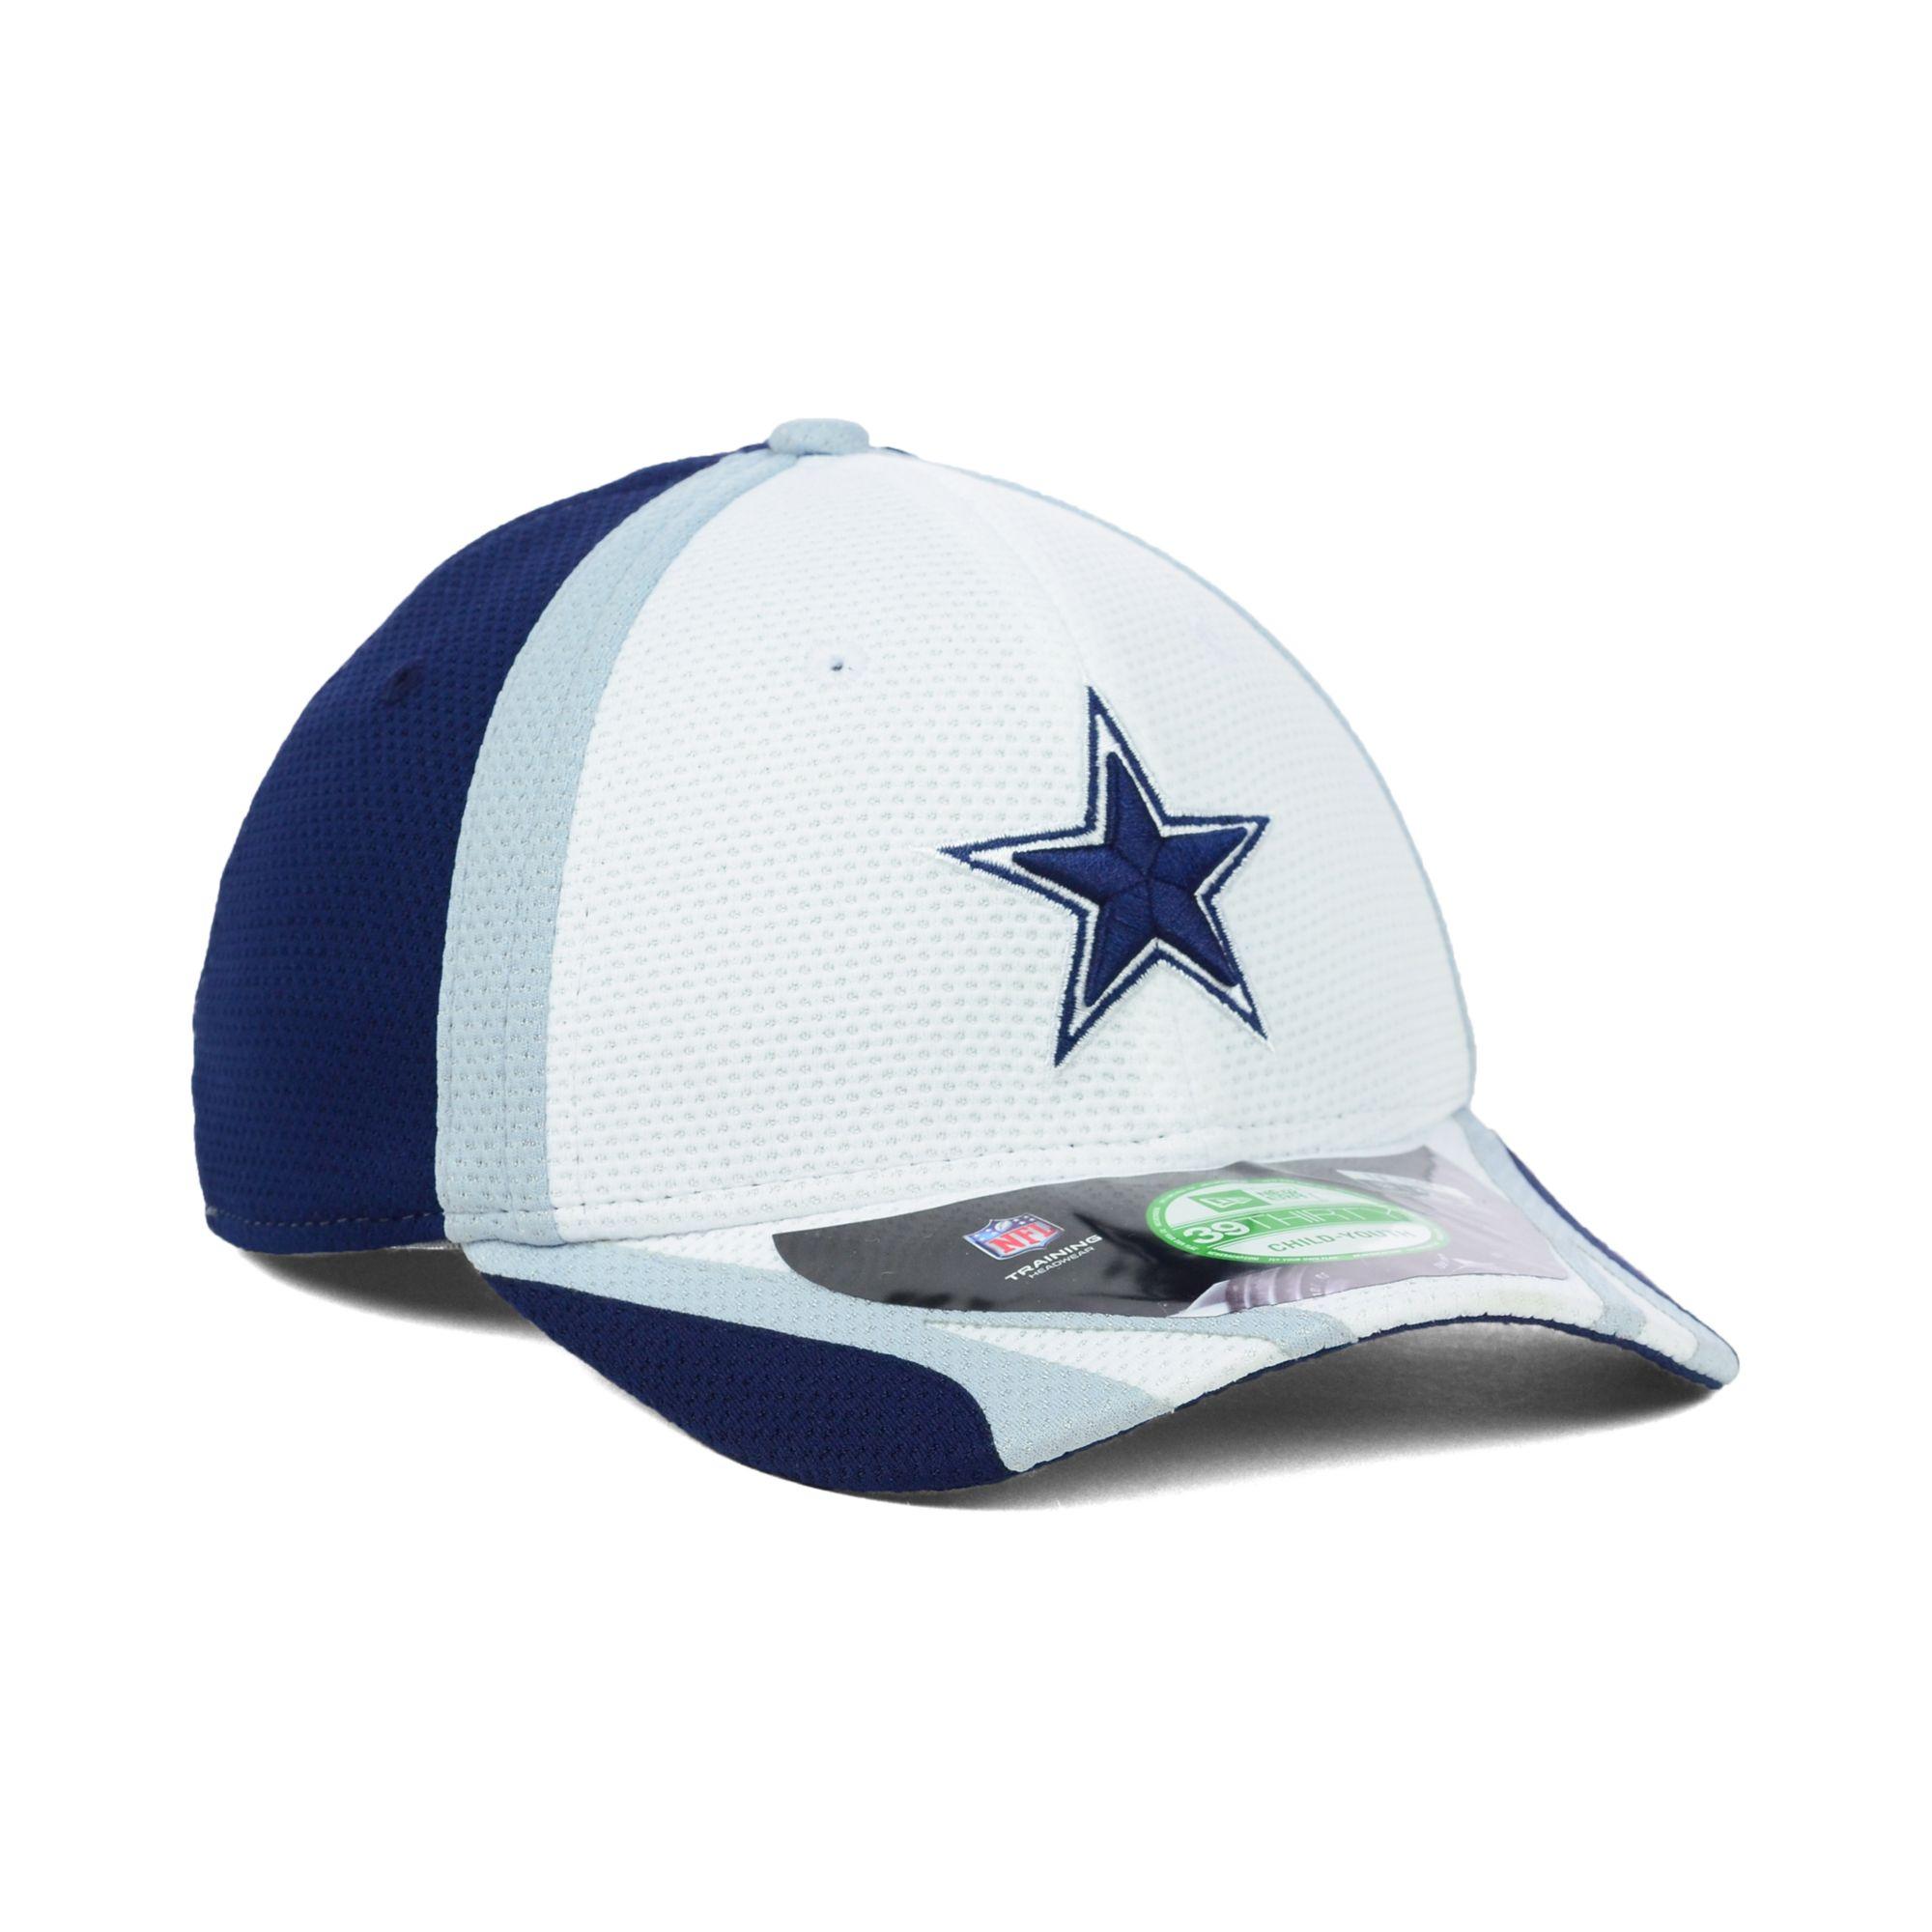 810bf2ba3a5 Lyst - KTZ Dallas Cowboys Training Camp 39thirty Kids Cap Or ...